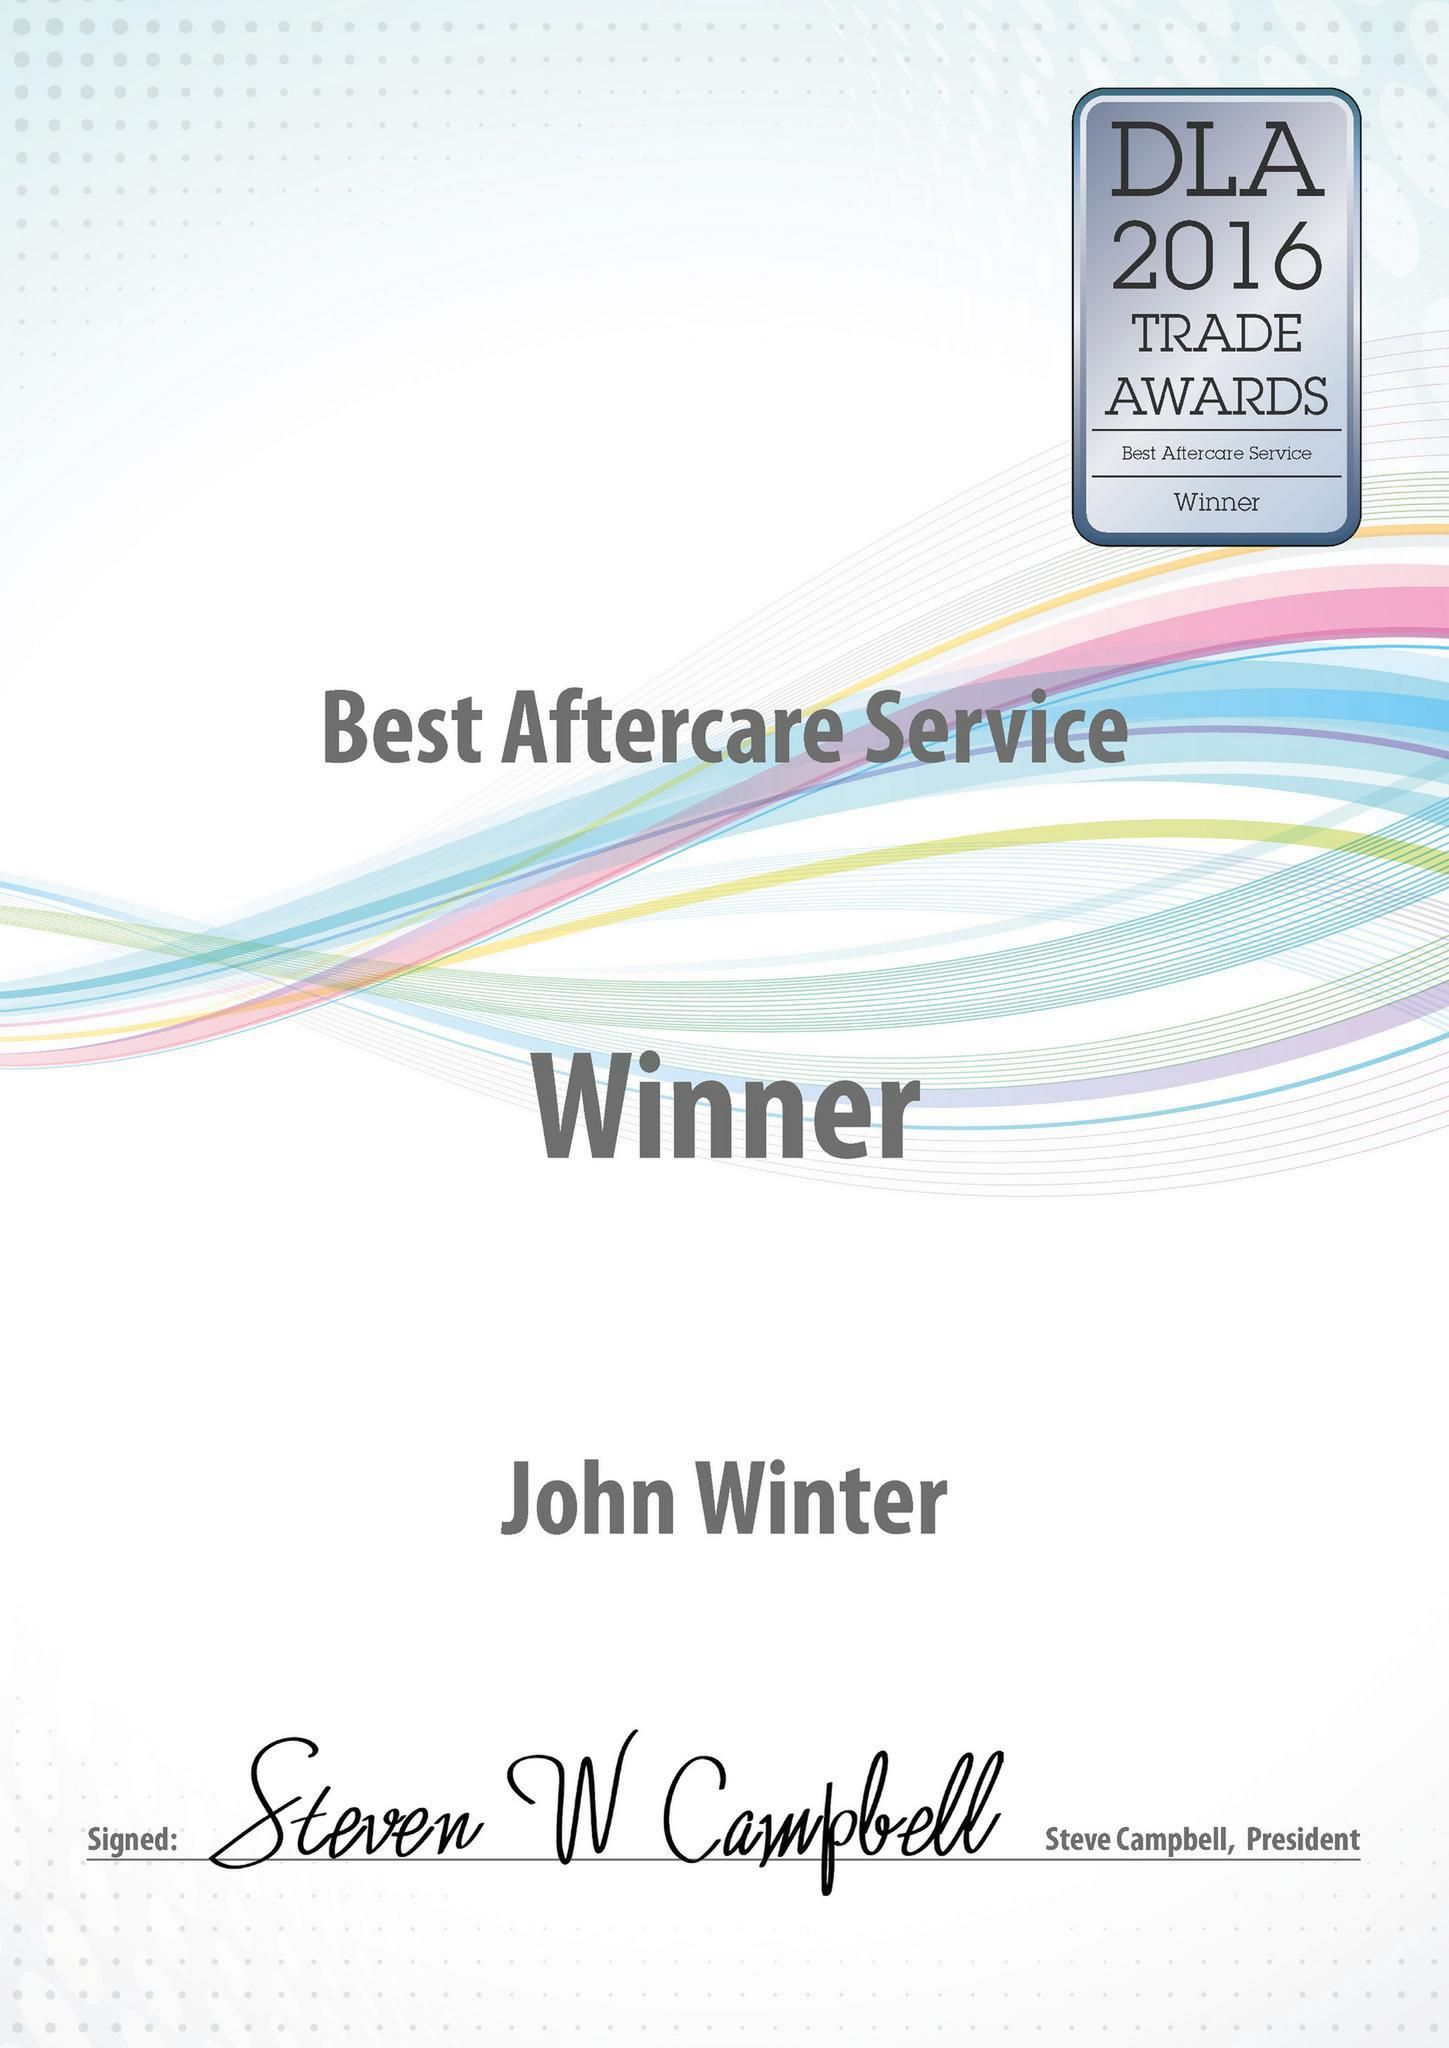 DLA Best aftercare service award